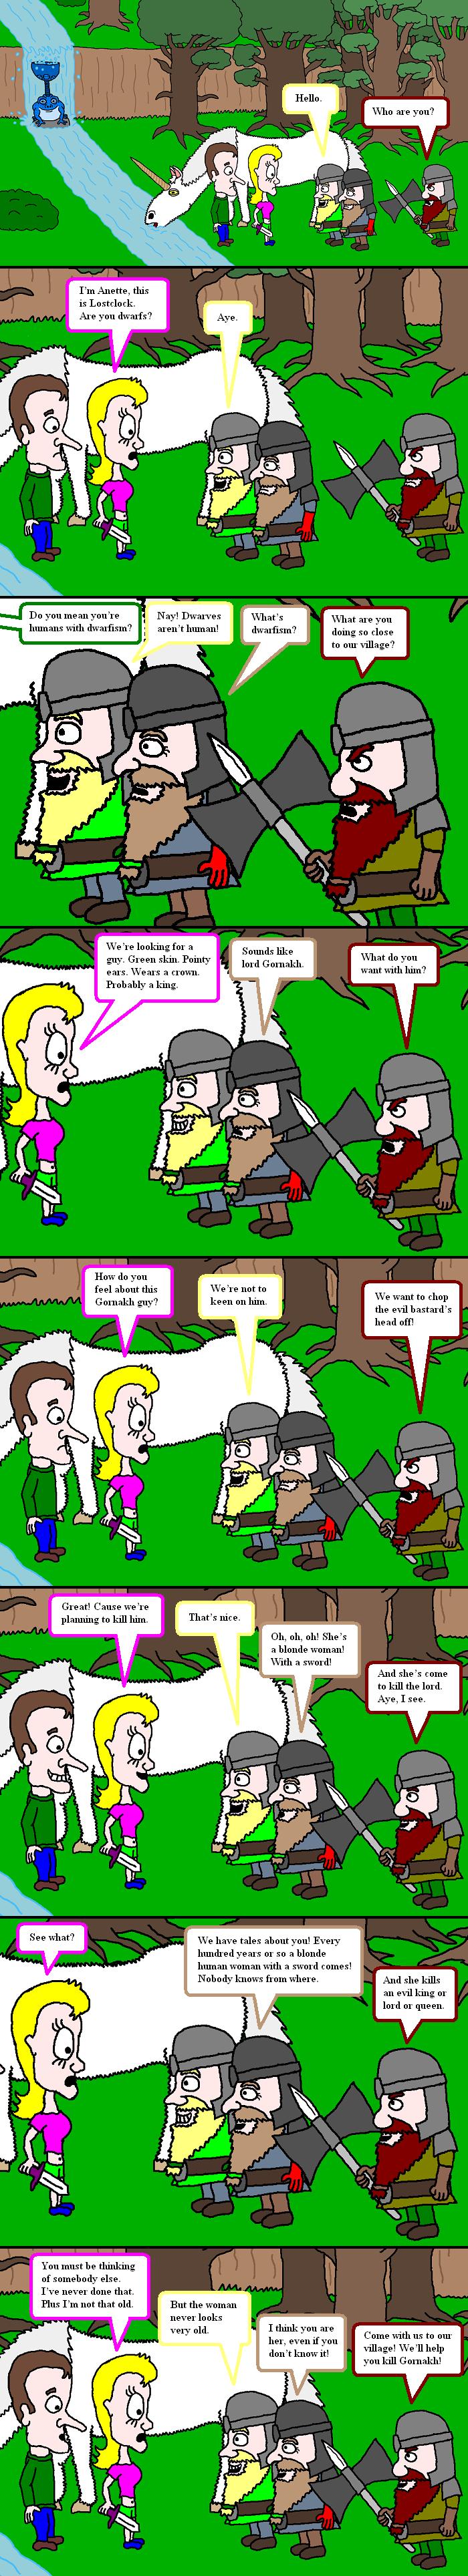 Dwarves and dwarfism